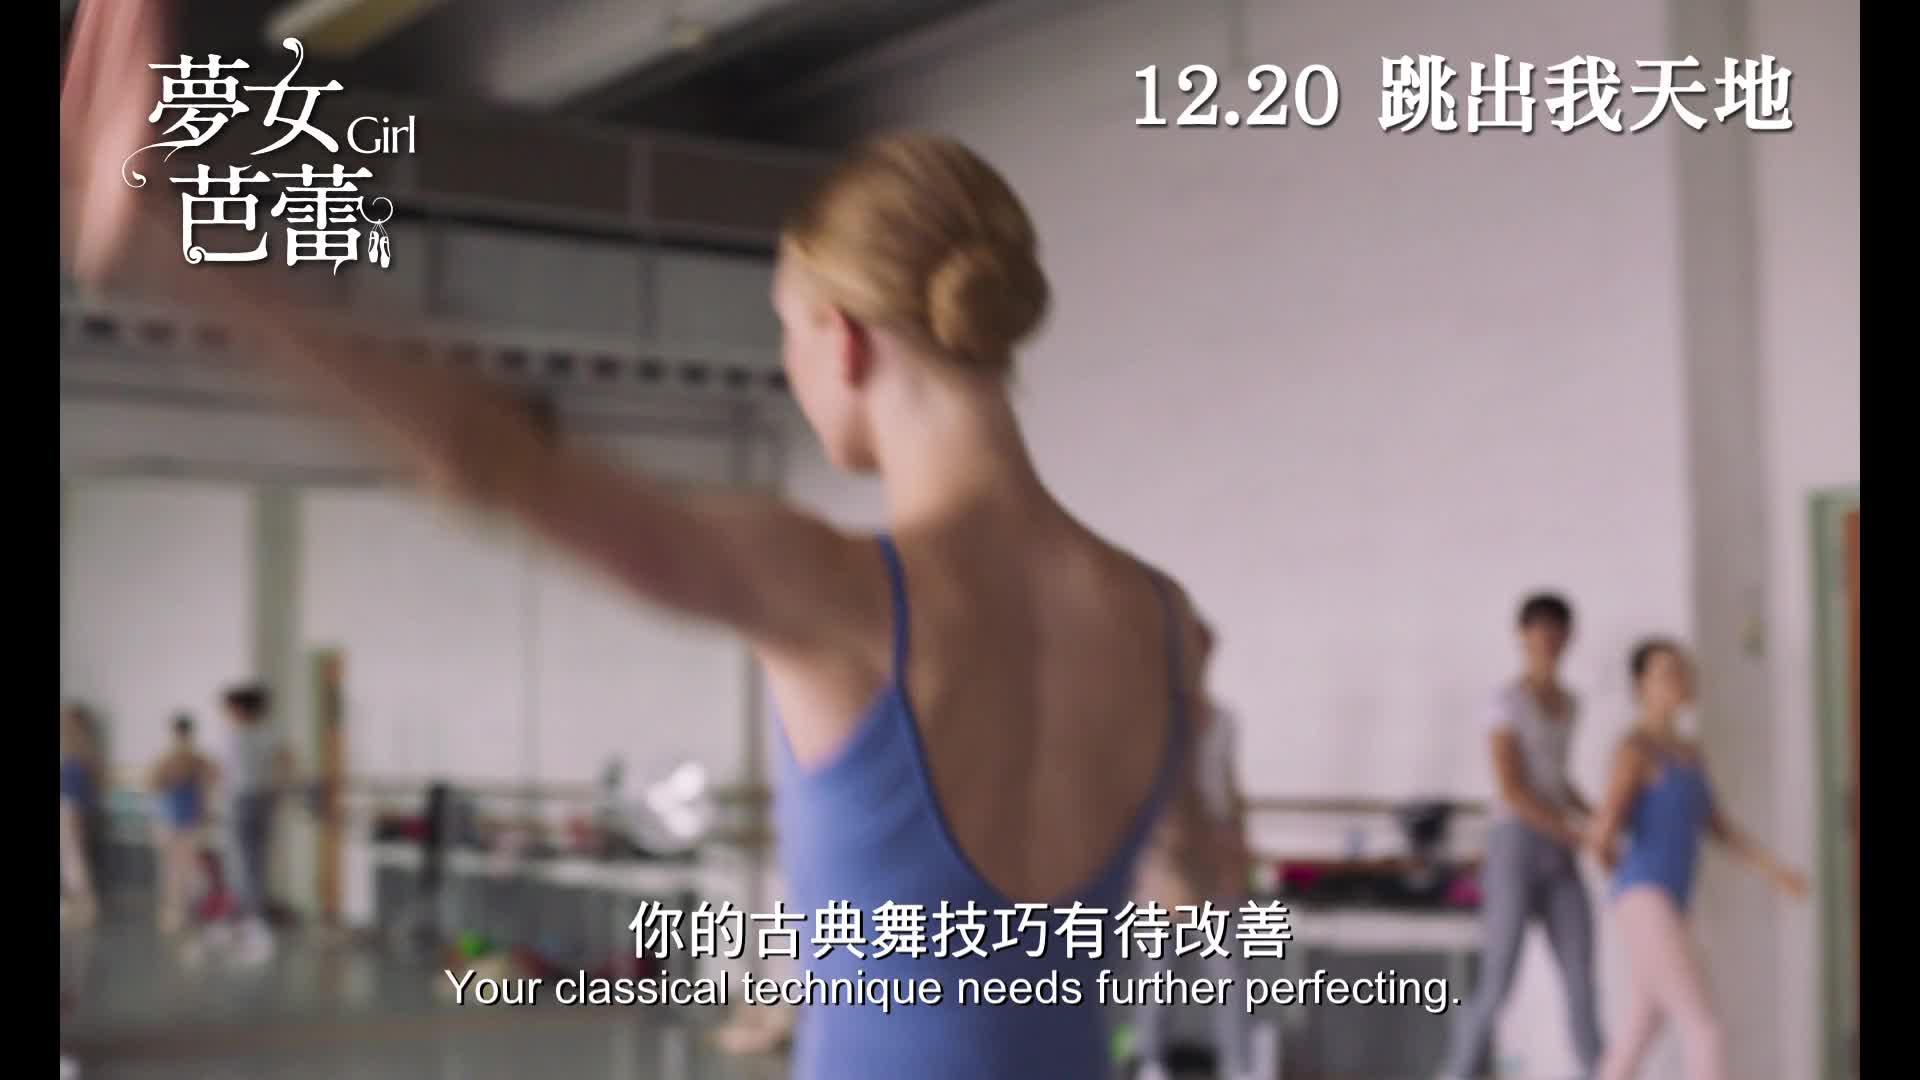 《夢女芭蕾》預告